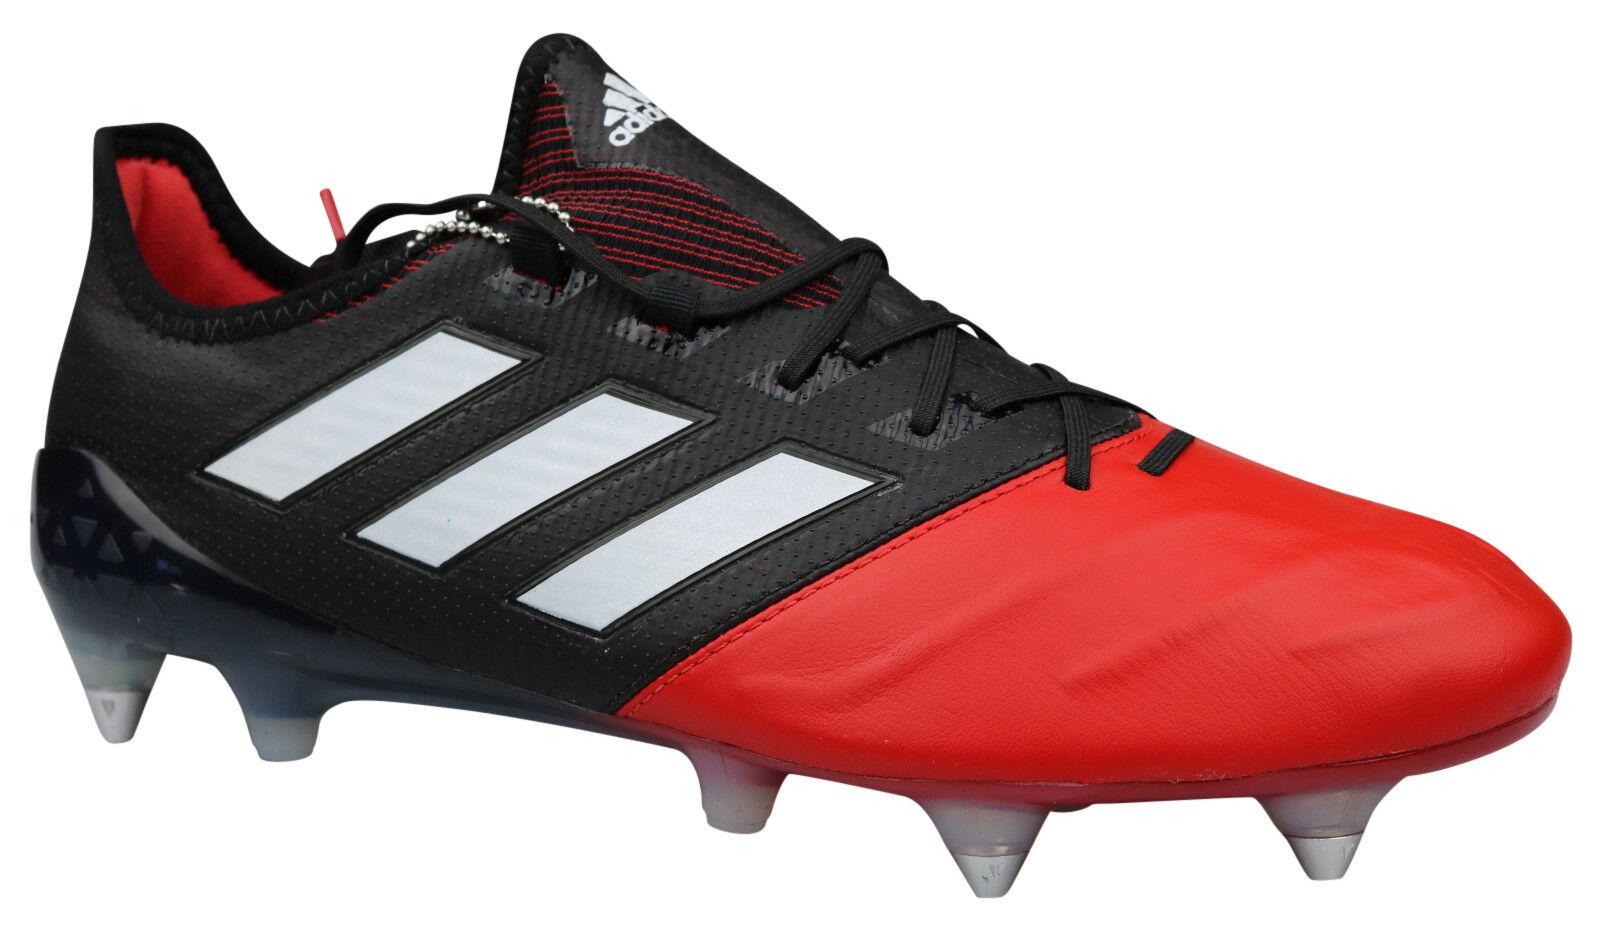 Adidas ACE 17.1 SG Fußballschuhe Leder Leder Leder Stollen schwarz BA9191 Gr 39 - 48 2 3 NEU fc82c6